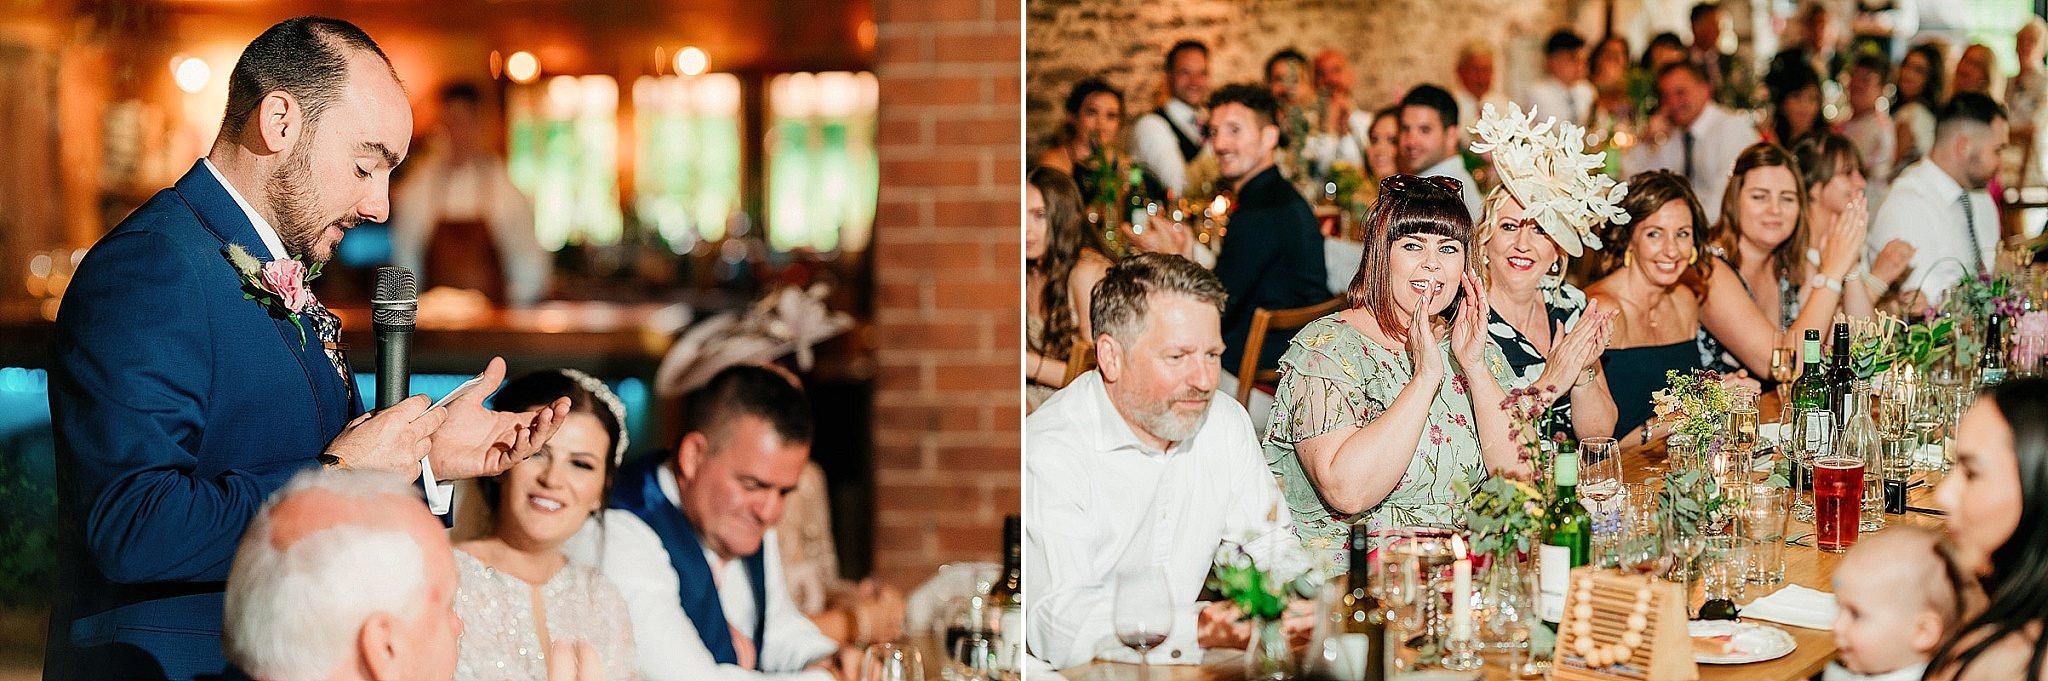 Dewsall Court Wedding Photography - Emily + Paul 56